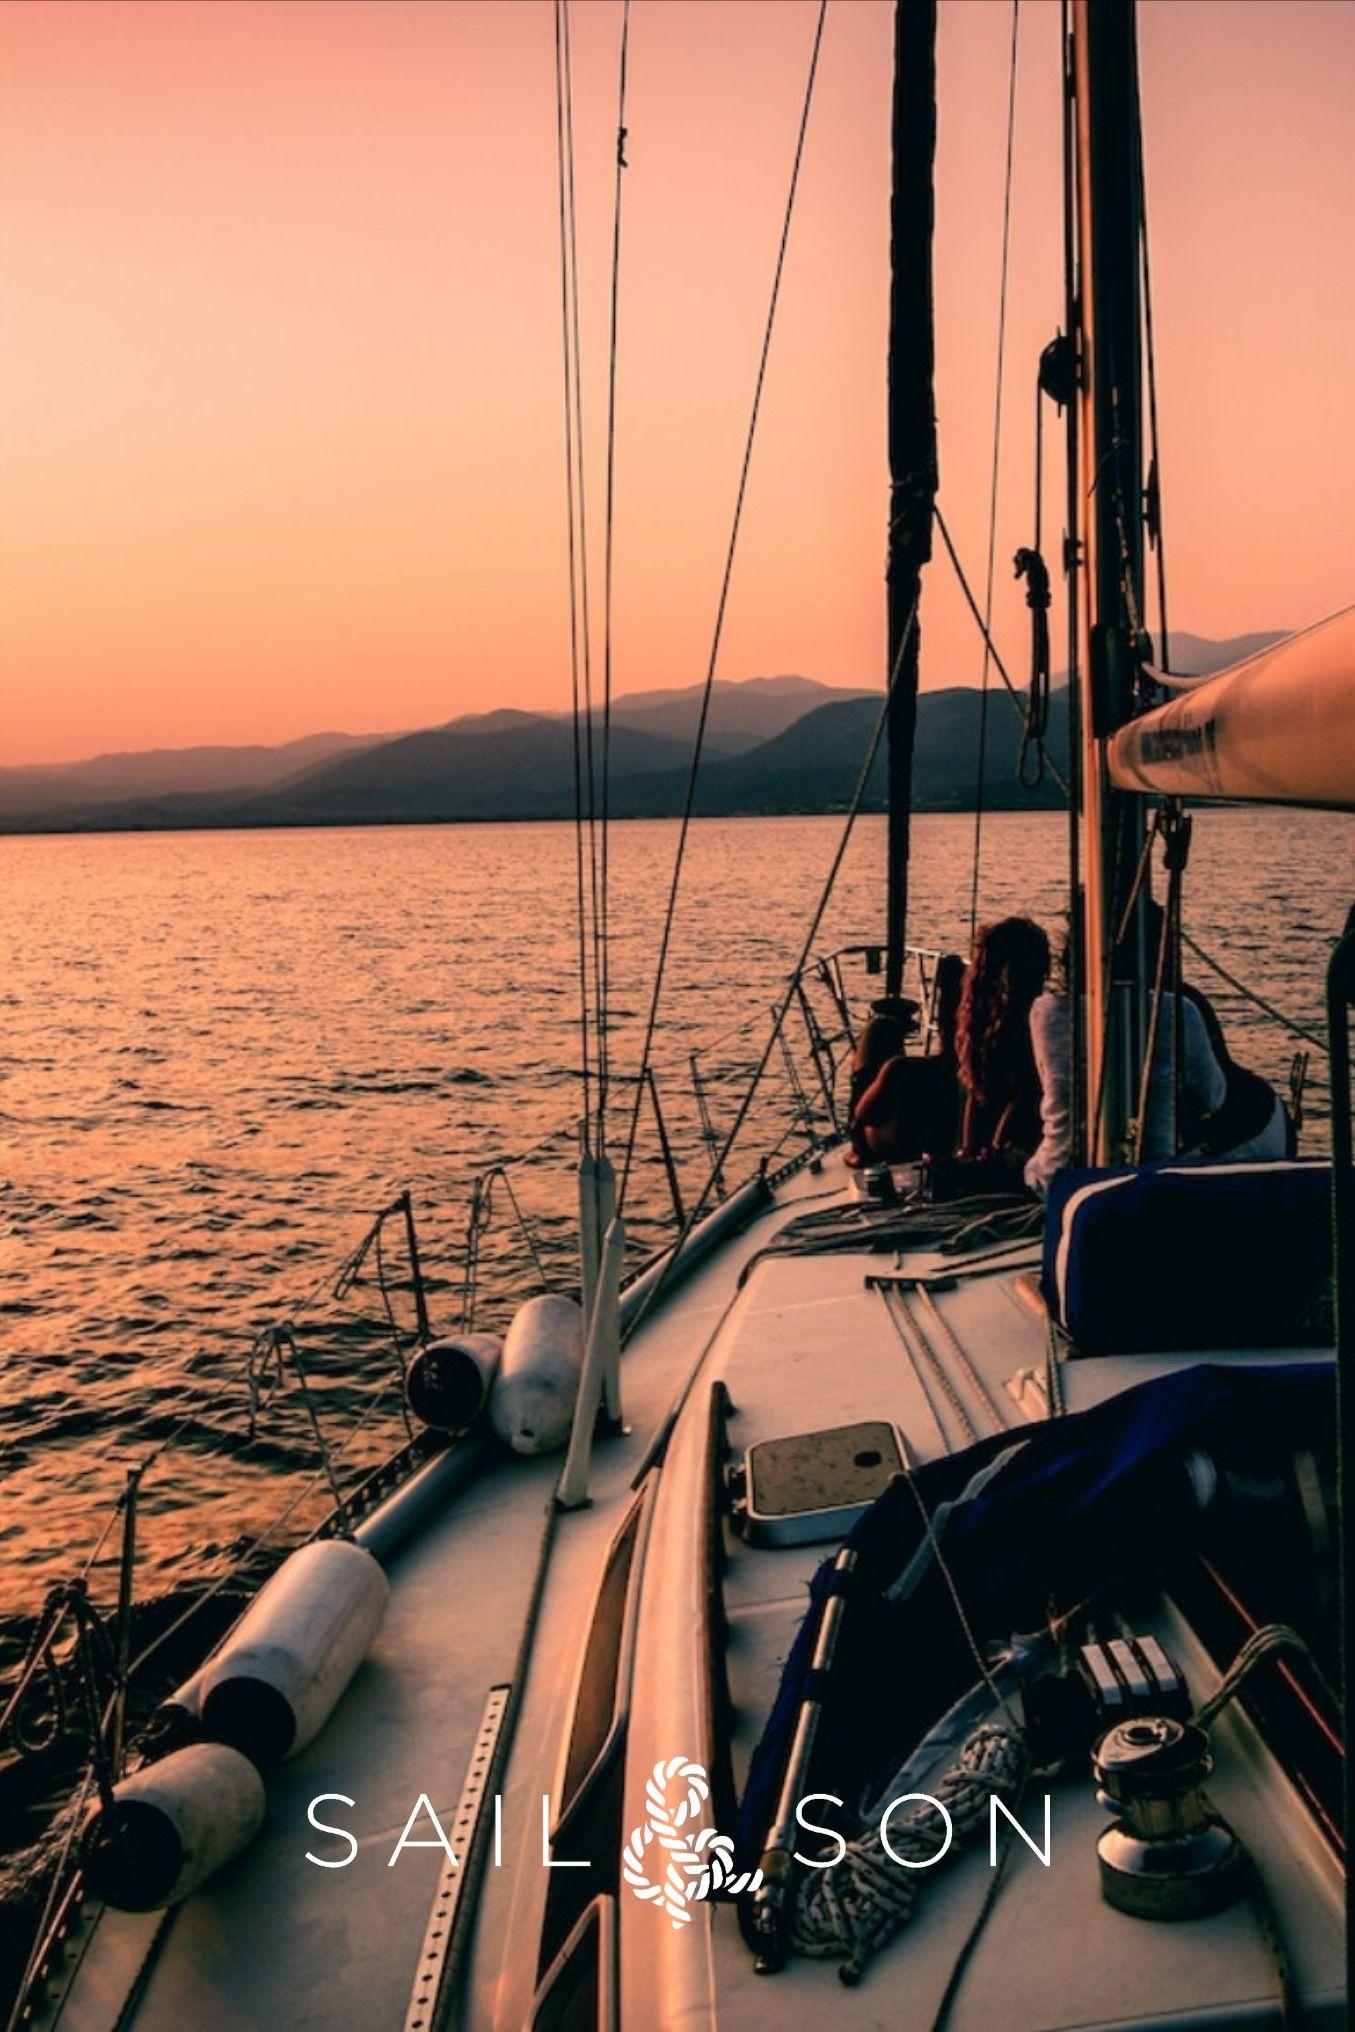 Desktop Wallpaper Of Monohull On Aegean Sea Sailing Trips Travel Aesthetic Travel